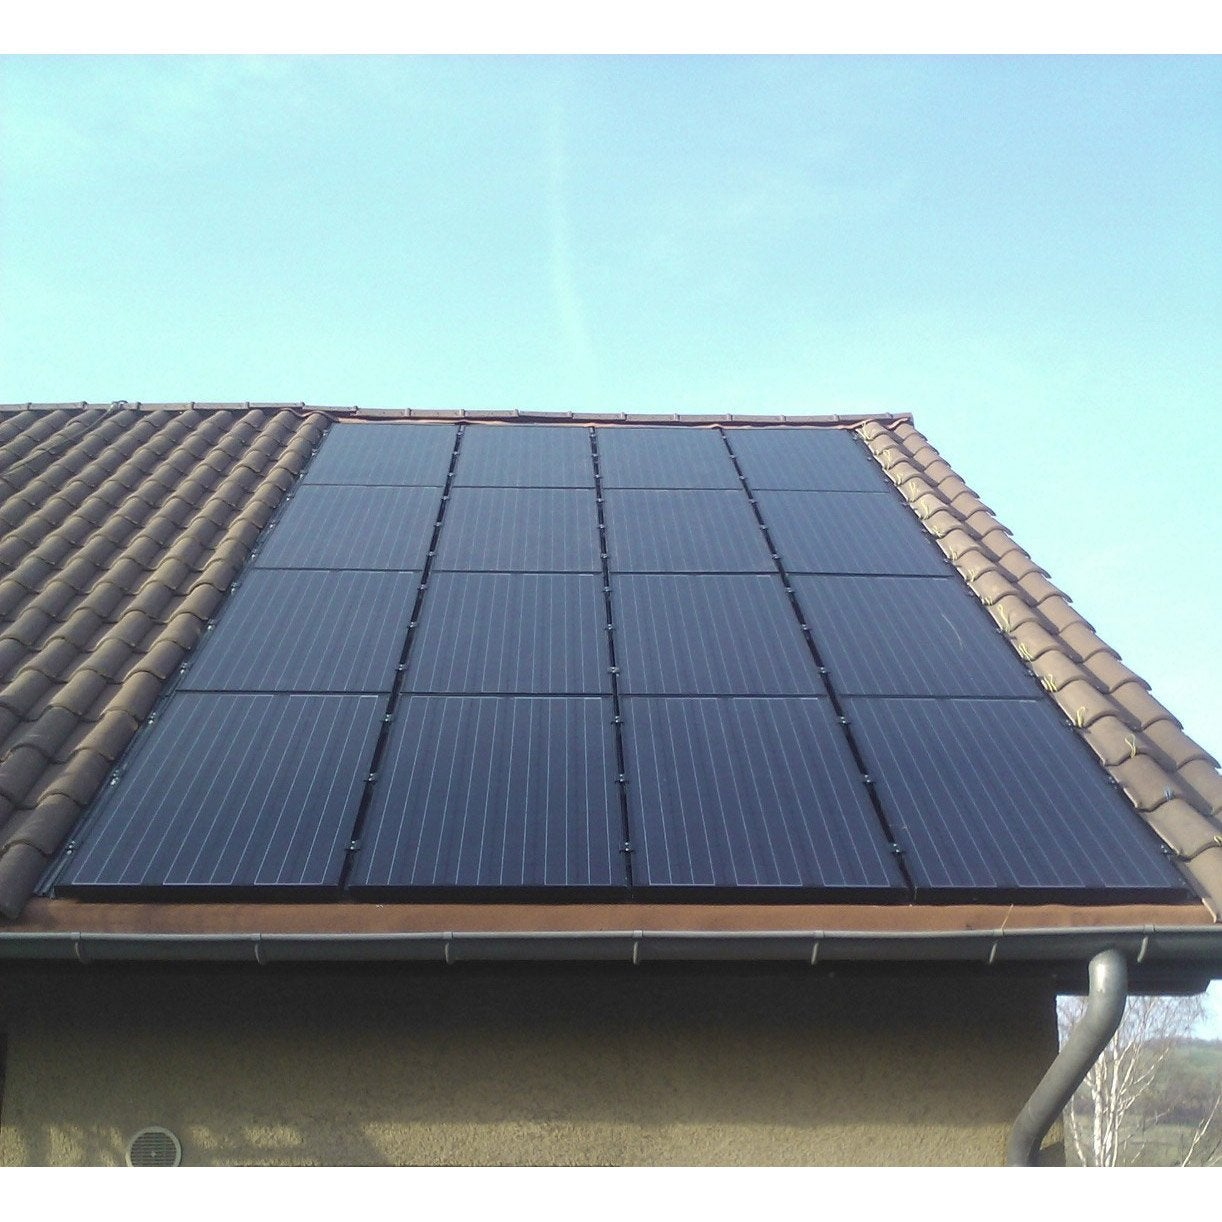 kit solaire photovolta que premium int gr watt home 3675w leroy merlin. Black Bedroom Furniture Sets. Home Design Ideas